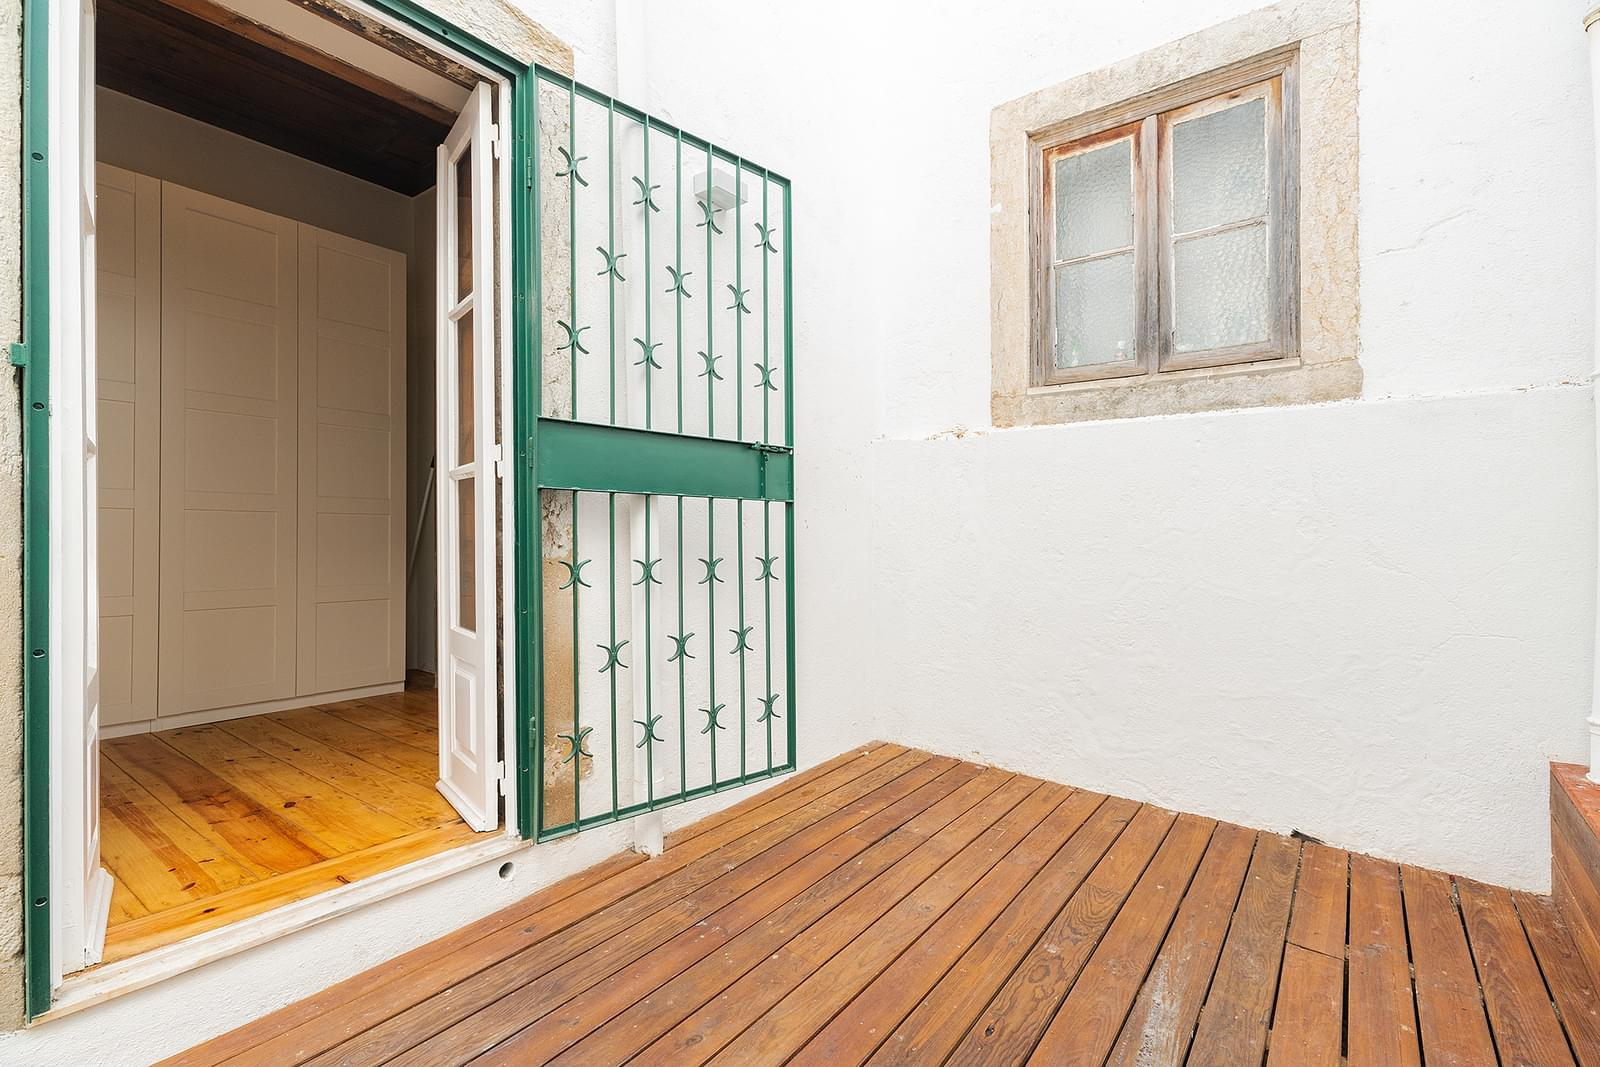 pf18016-apartamento-t2-1-lisboa-8d2a4a37-f61f-40f6-b184-a39f10c85611